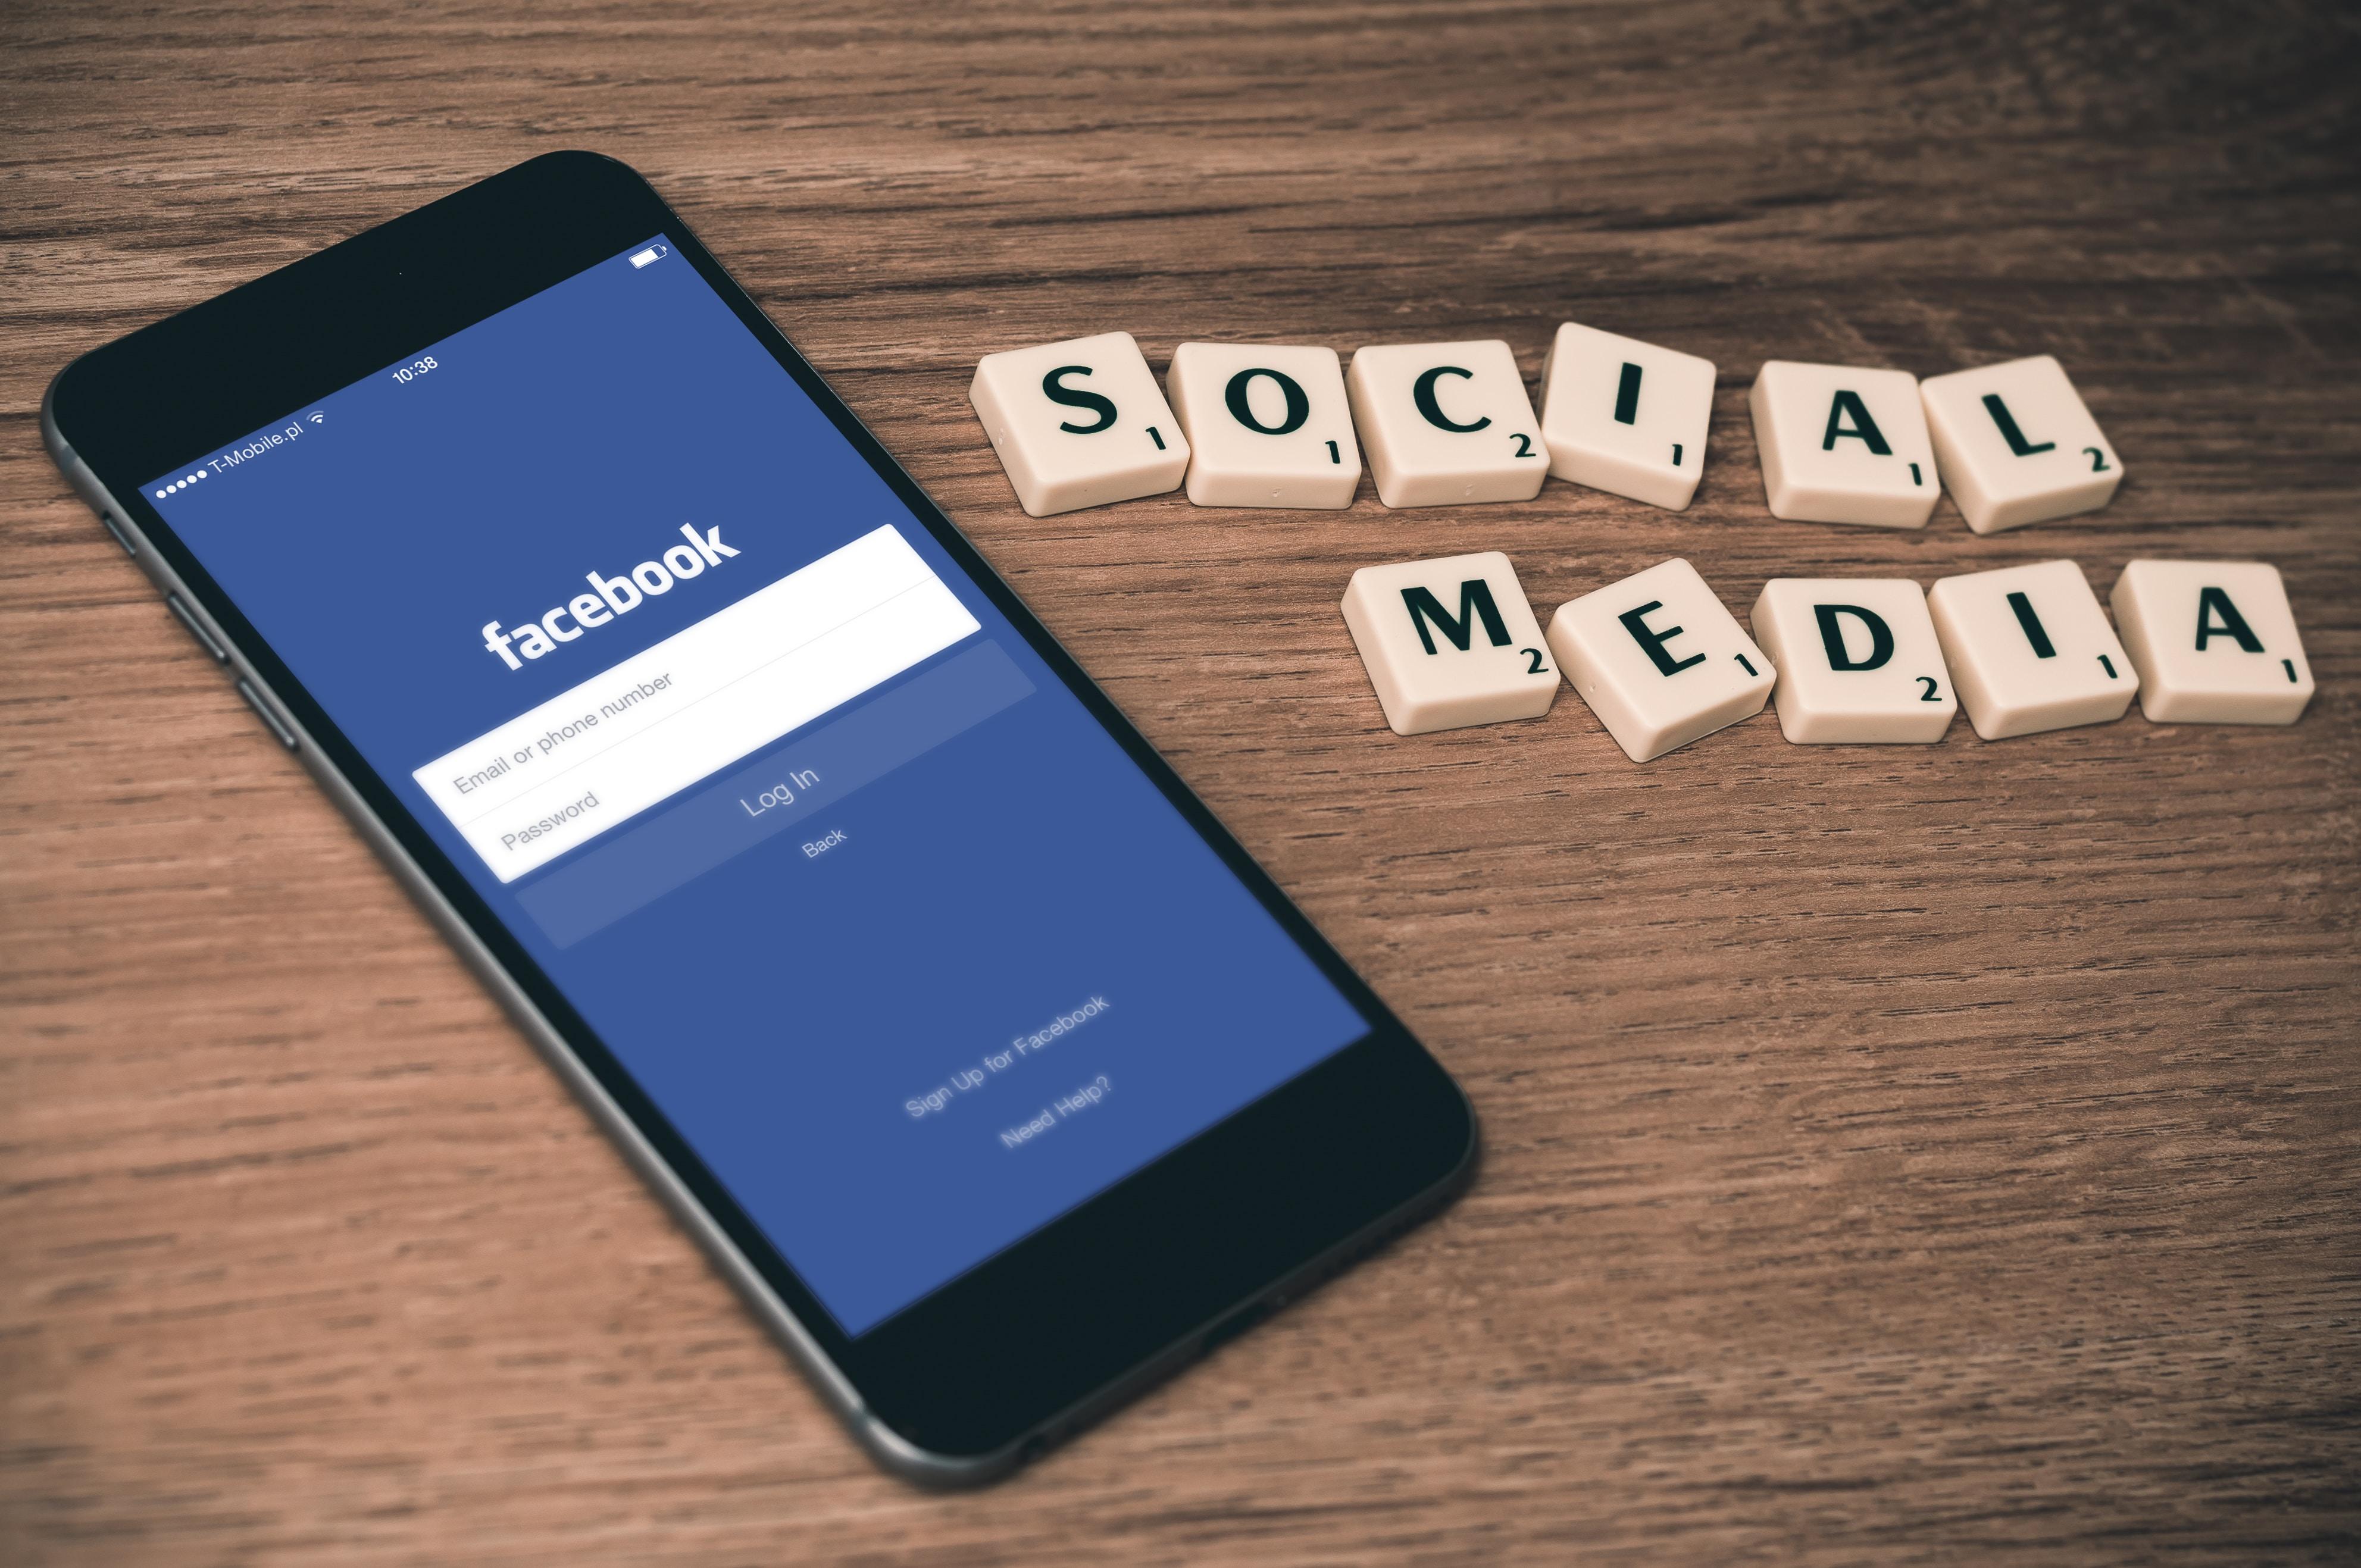 Indonesia  Blokir Clubhouse, WhatsApp, Netflix , Facebook Jika Tidak Daftar Sampai Mei